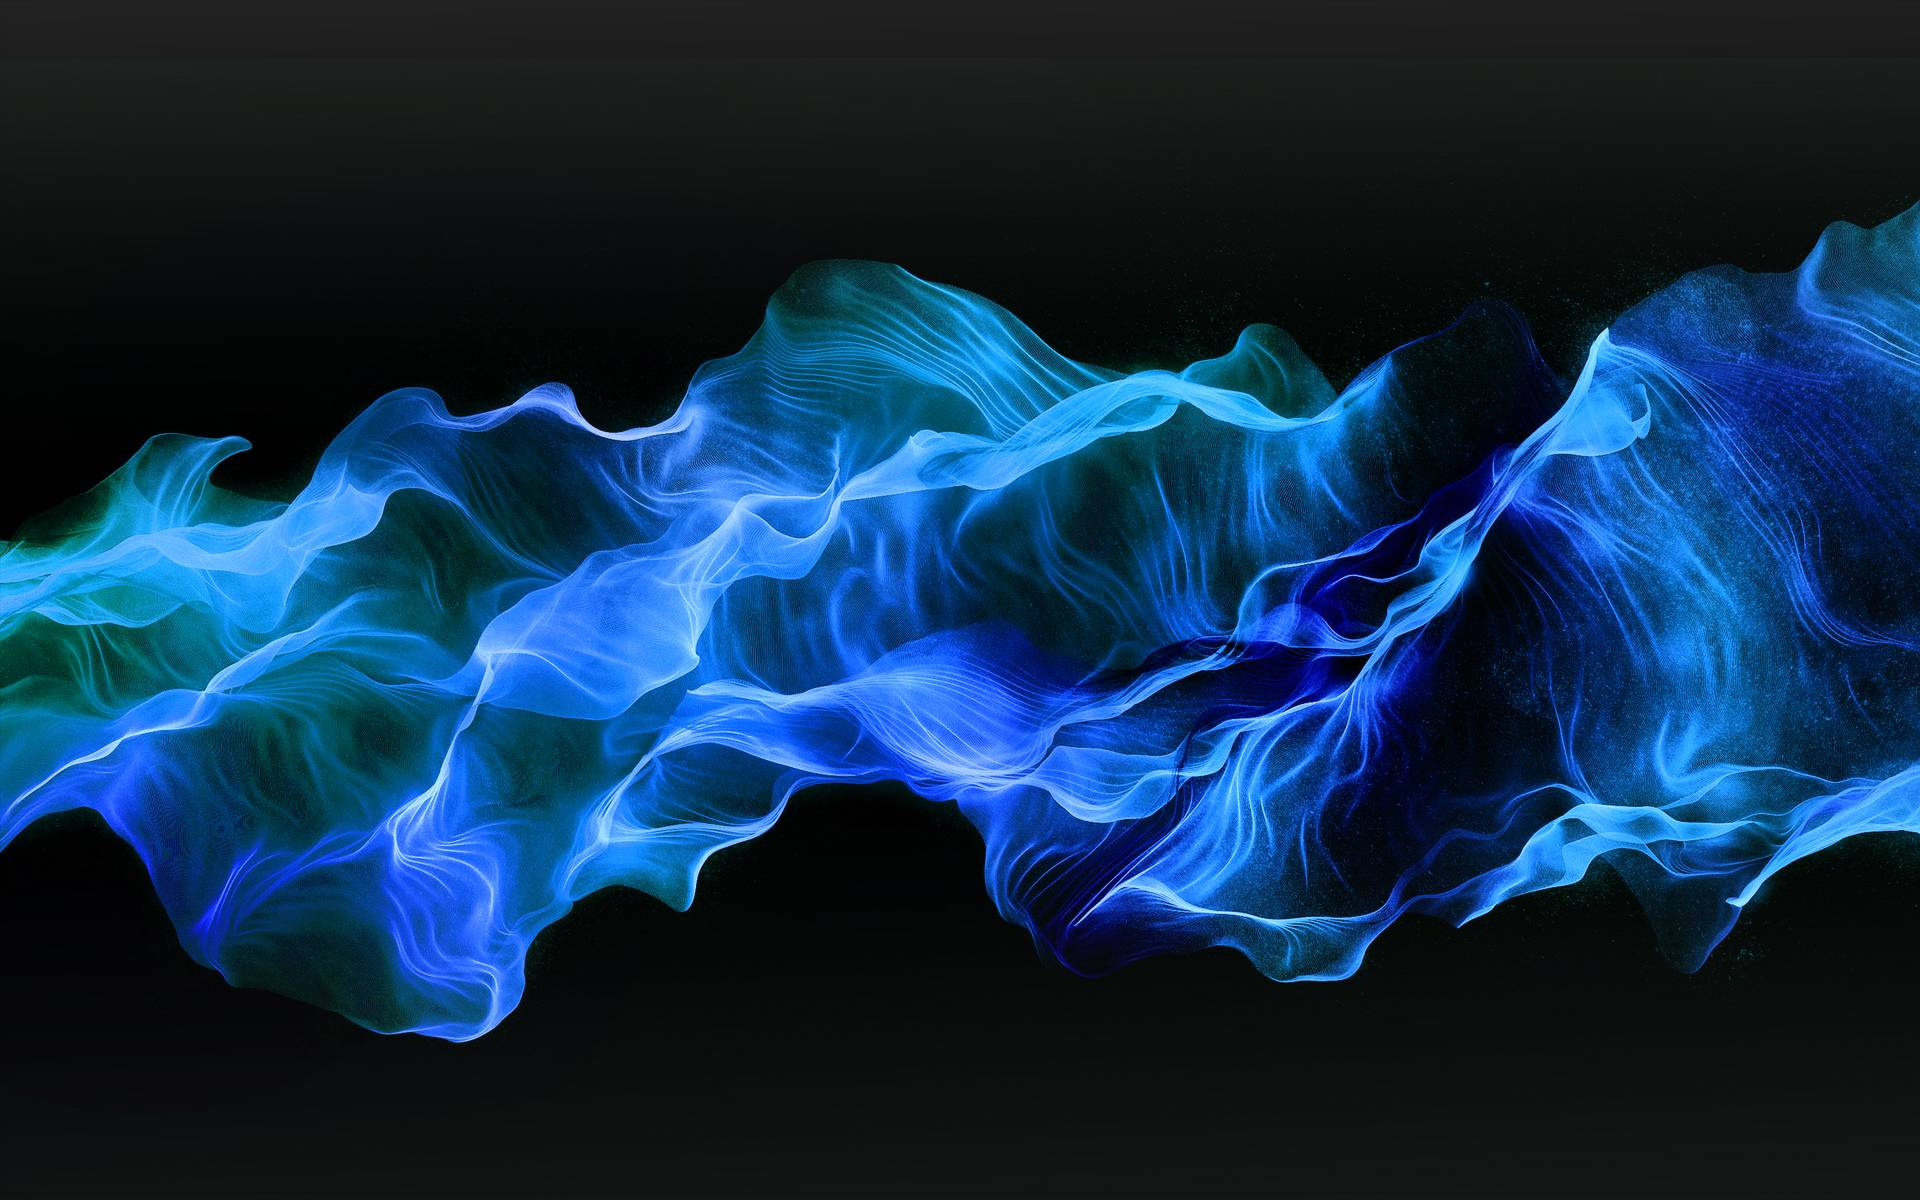 Blue Fire Wallpapers 1920x1200